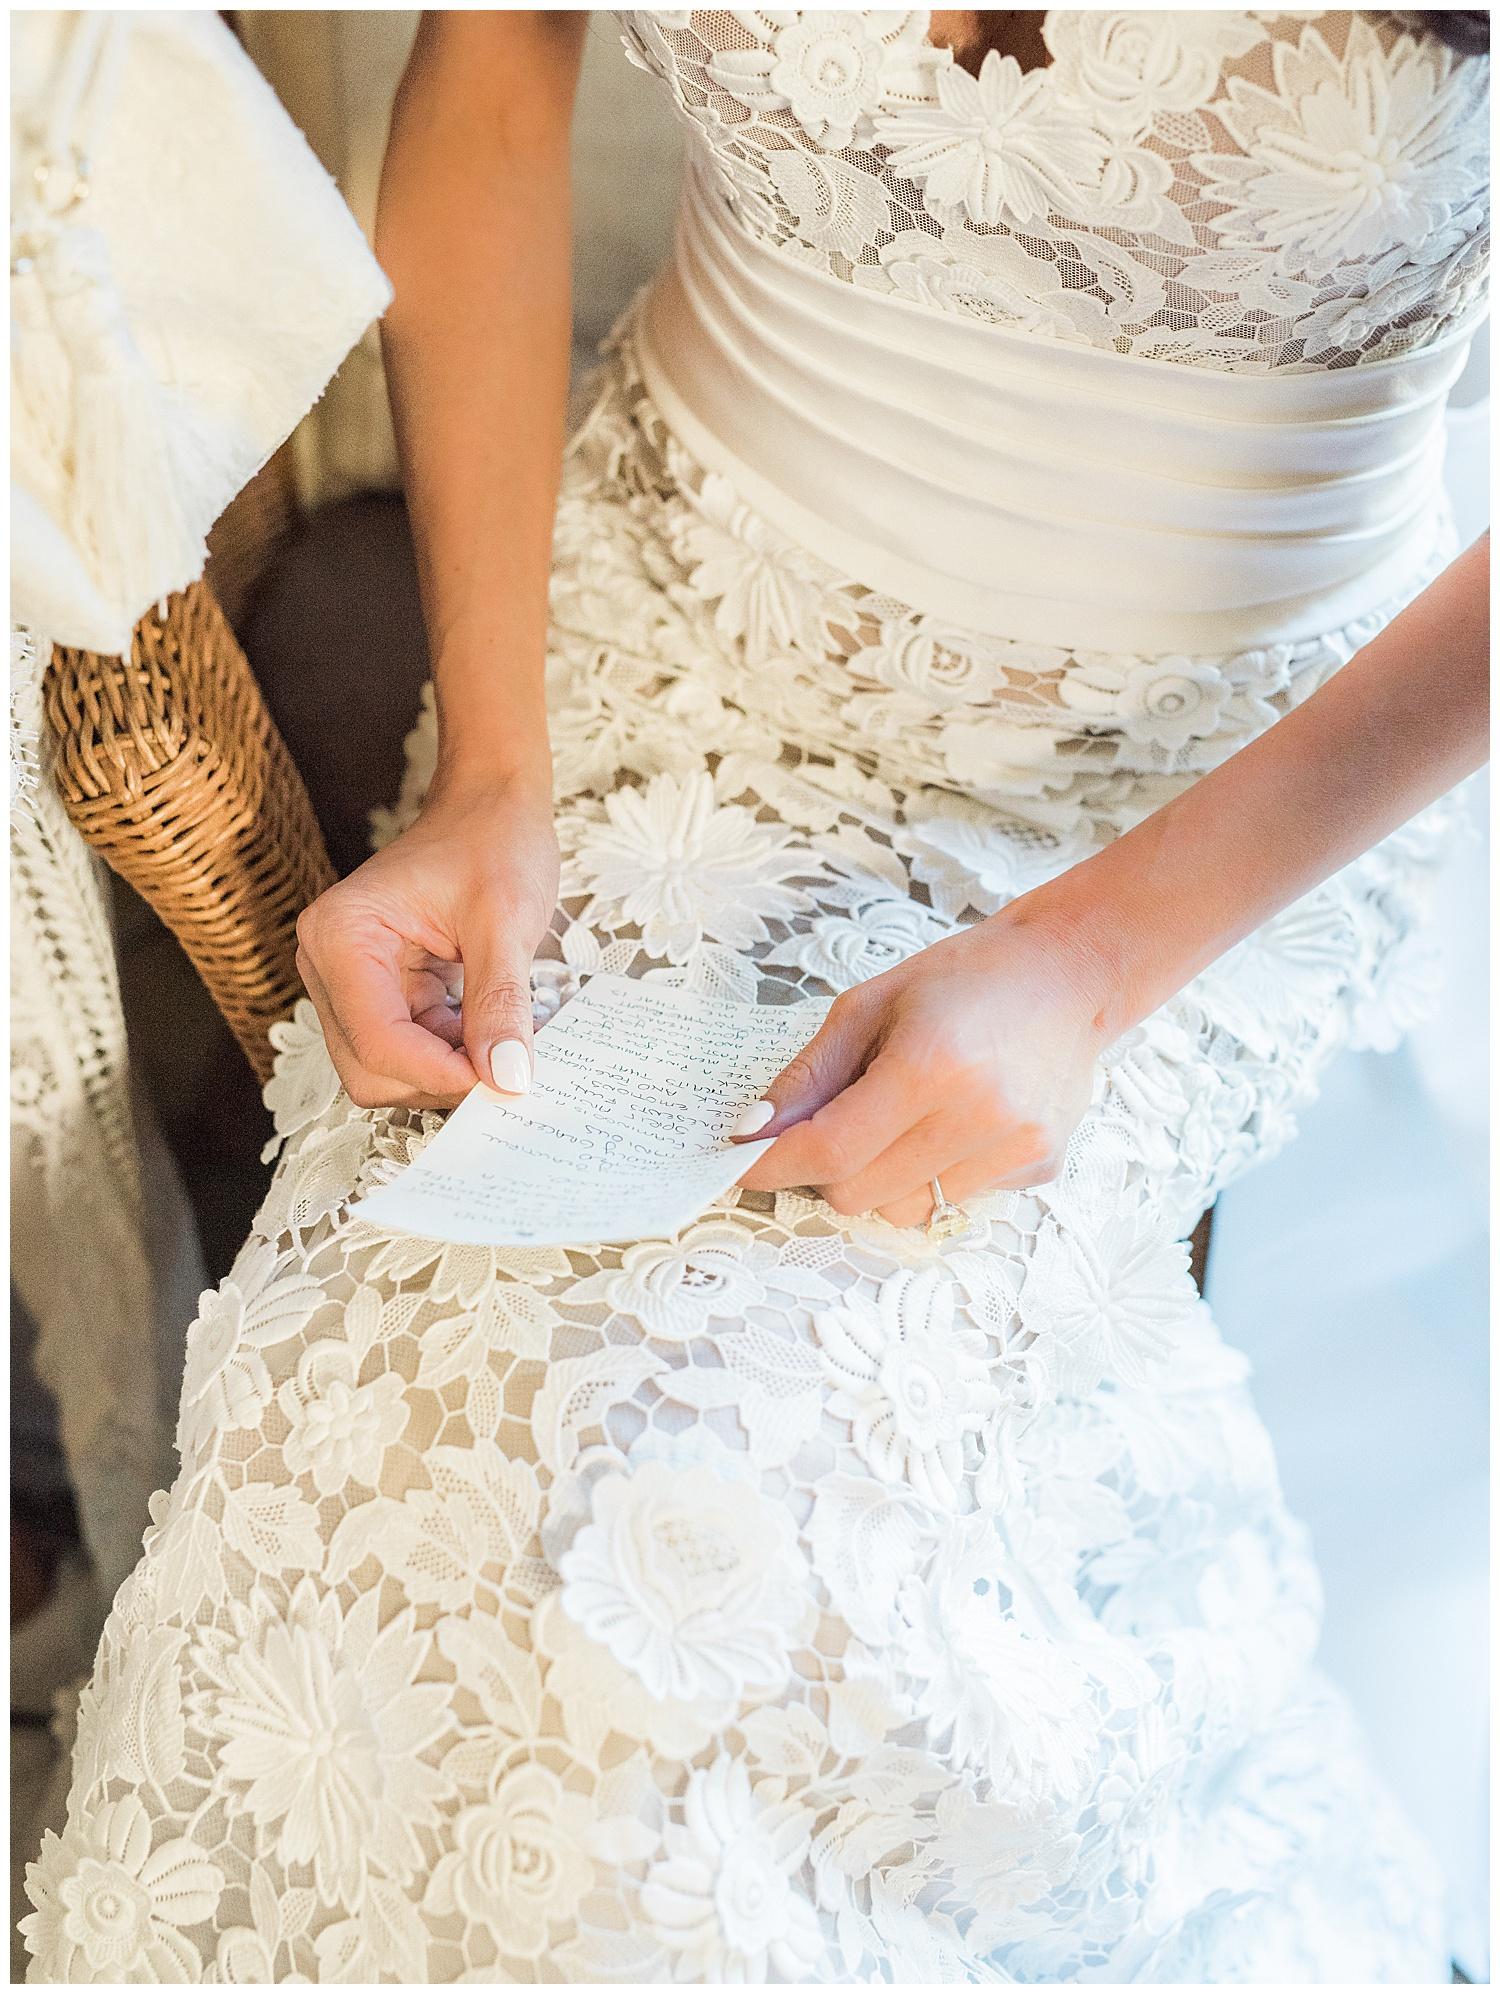 Janine_Licare_Photography_San_Francisco_Wedding_Photographer_Meadowood_Napa_Valley_Sonoma_0010.jpg